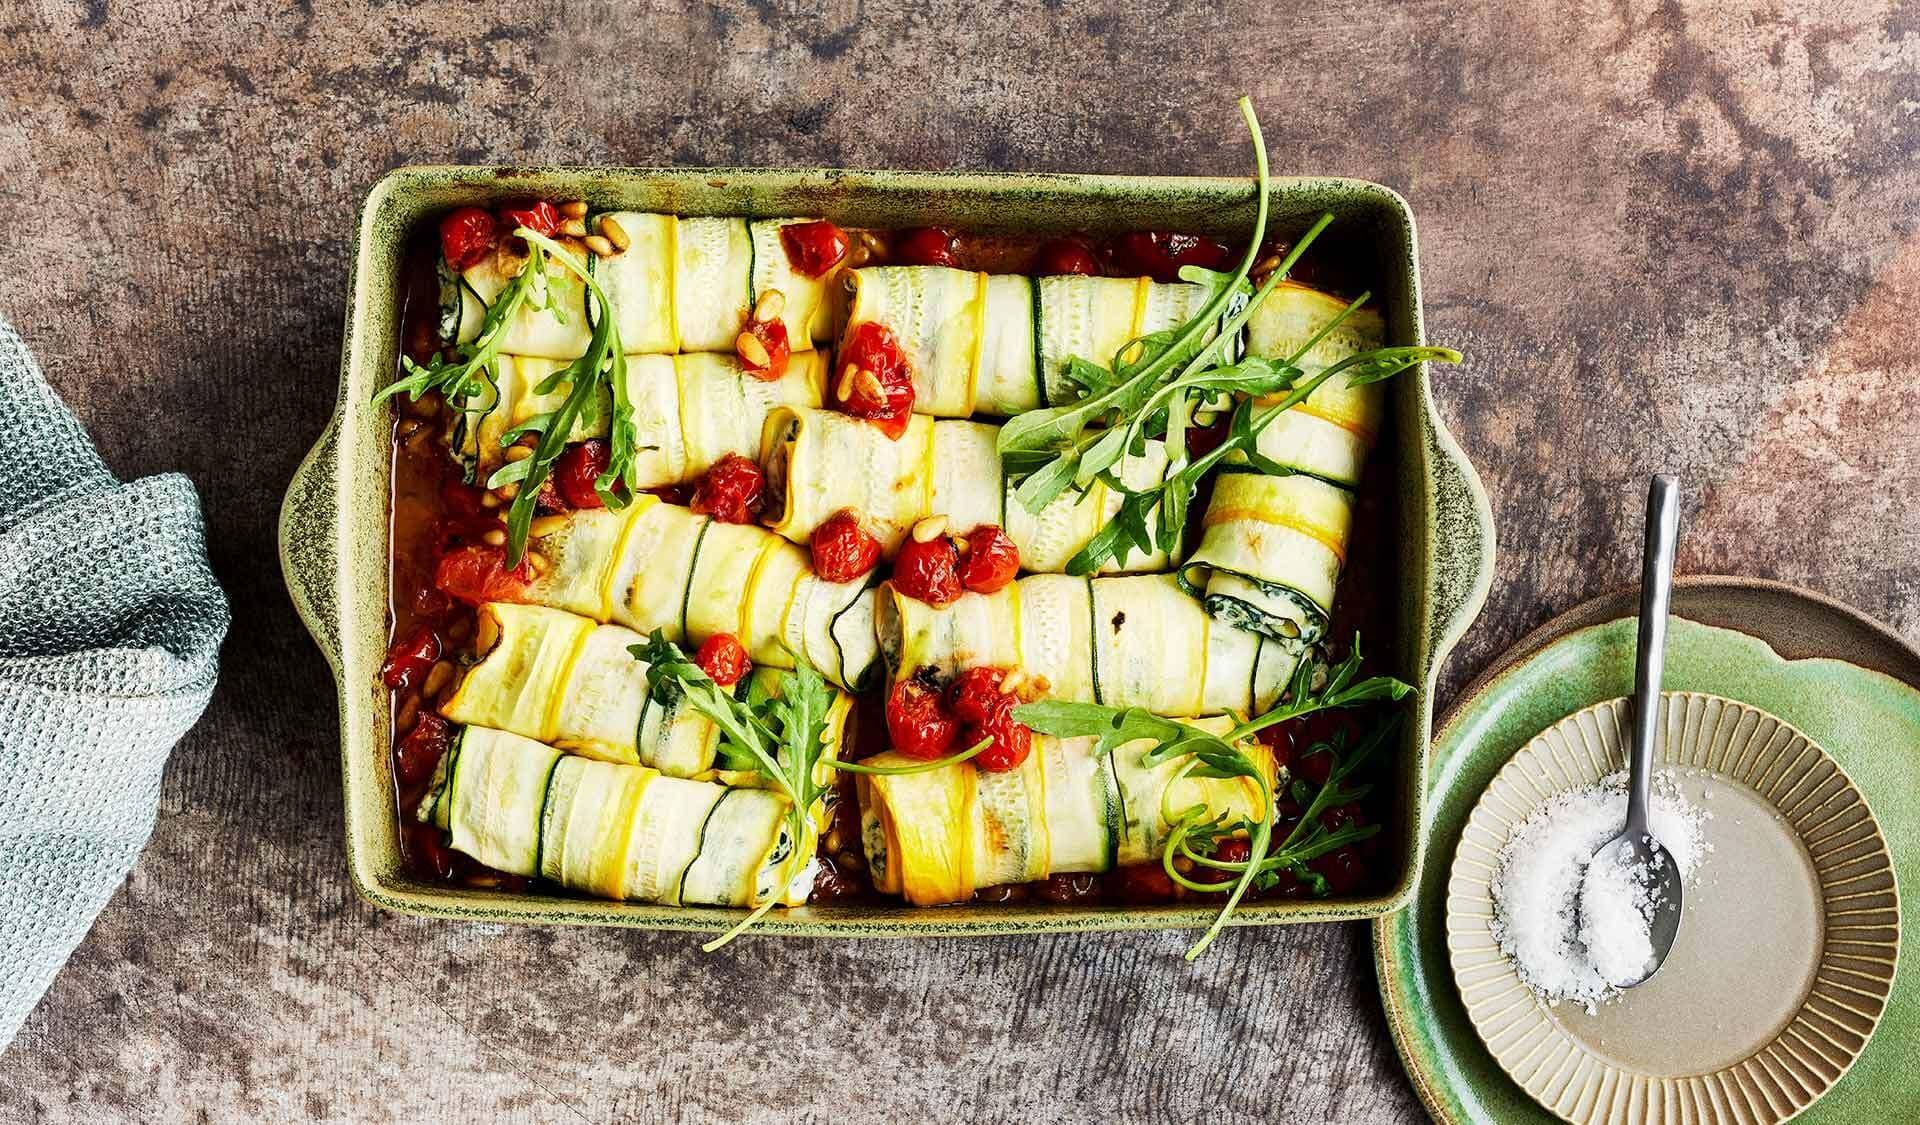 Zucchini-Röllchen mit Tomatensoße